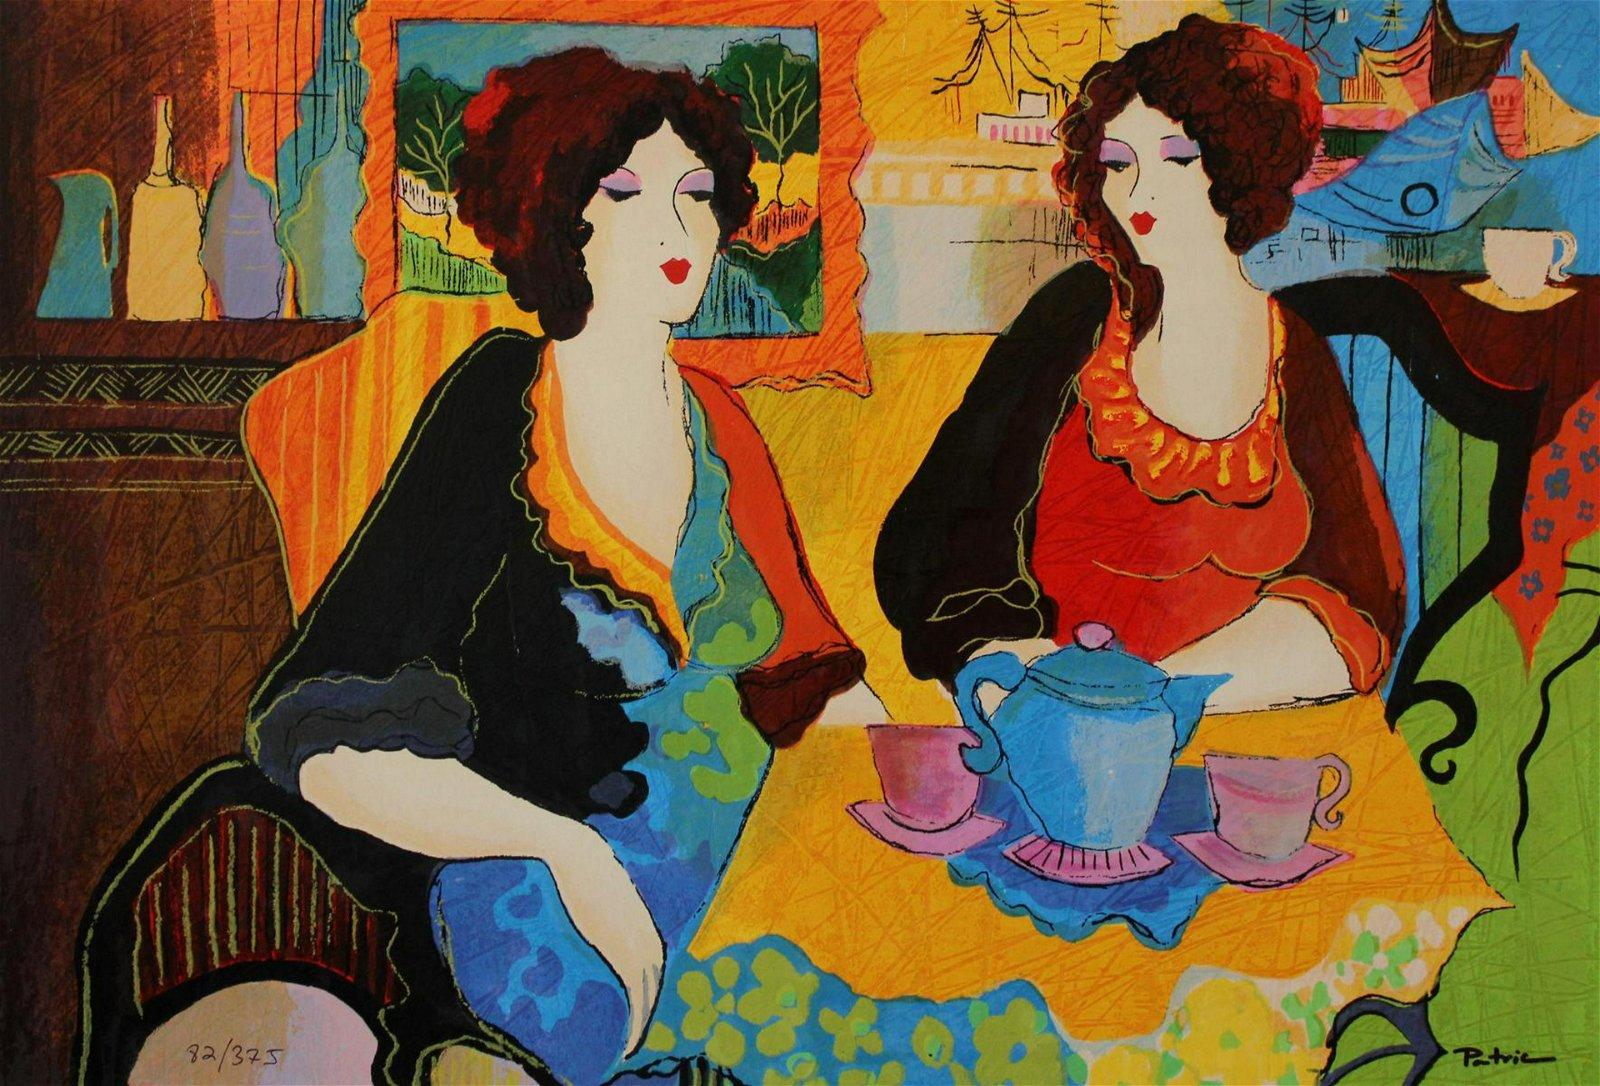 Patricia Govezensky- Original Serigraph on Canvas